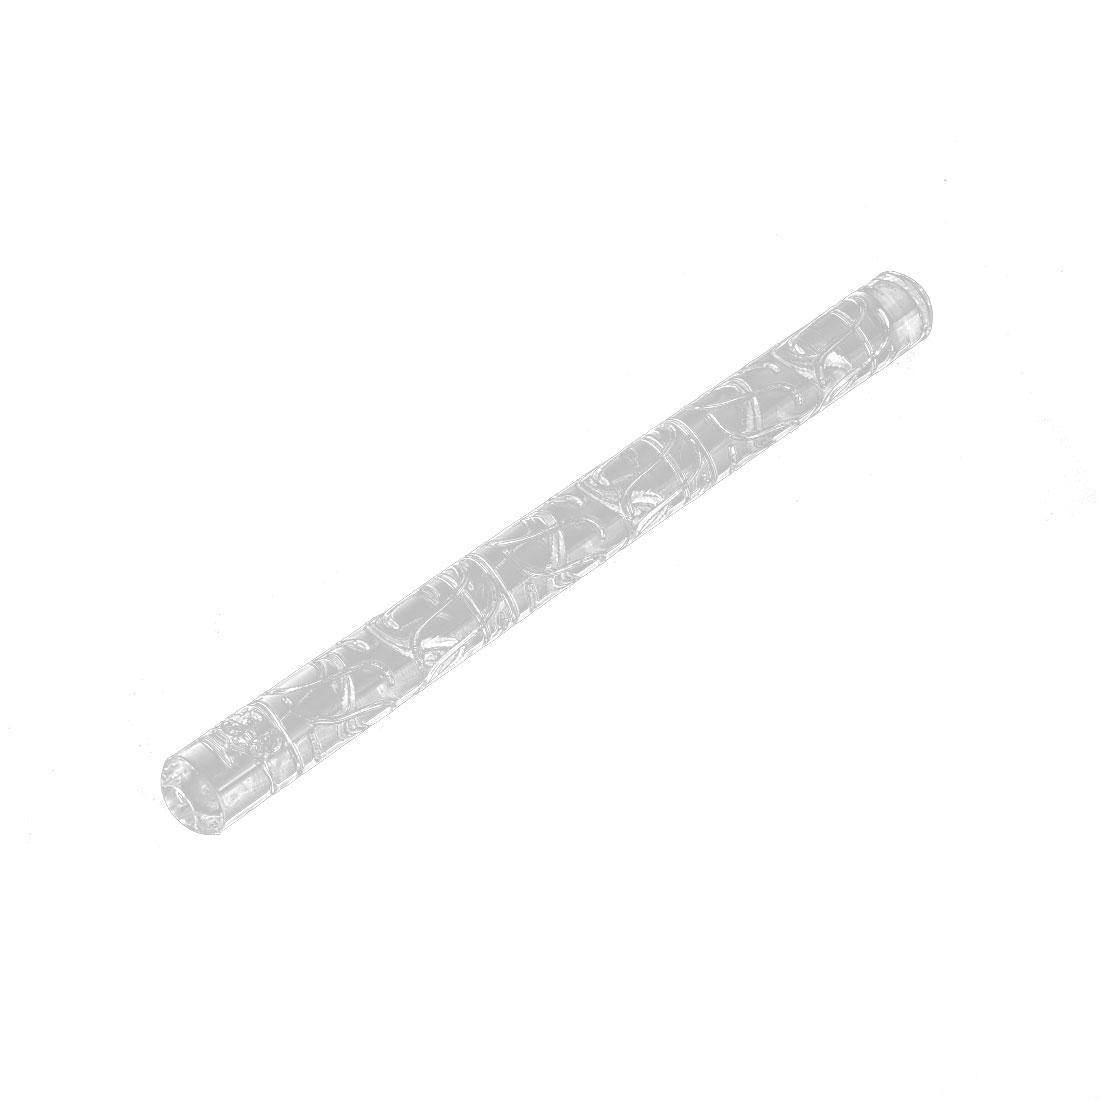 Unique Bargains Non-stick Curve Pattern Cookie Biscuit Maker Fondant Roller Rolling Pin